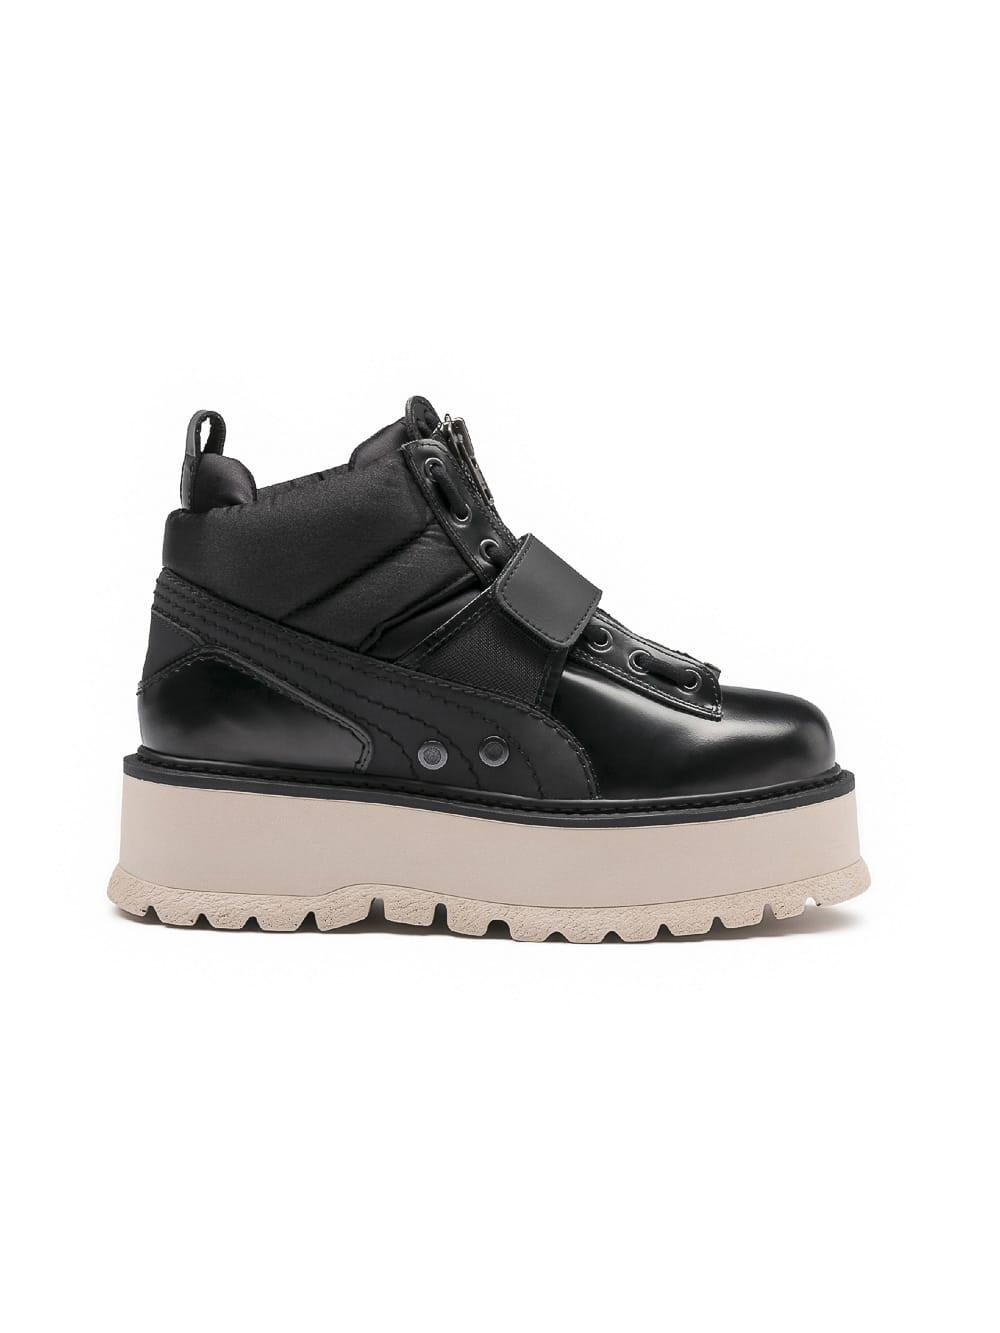 ced11b0dba82b0 PUMA Fenty X By Rihanna Sneaker Boots - Lyst